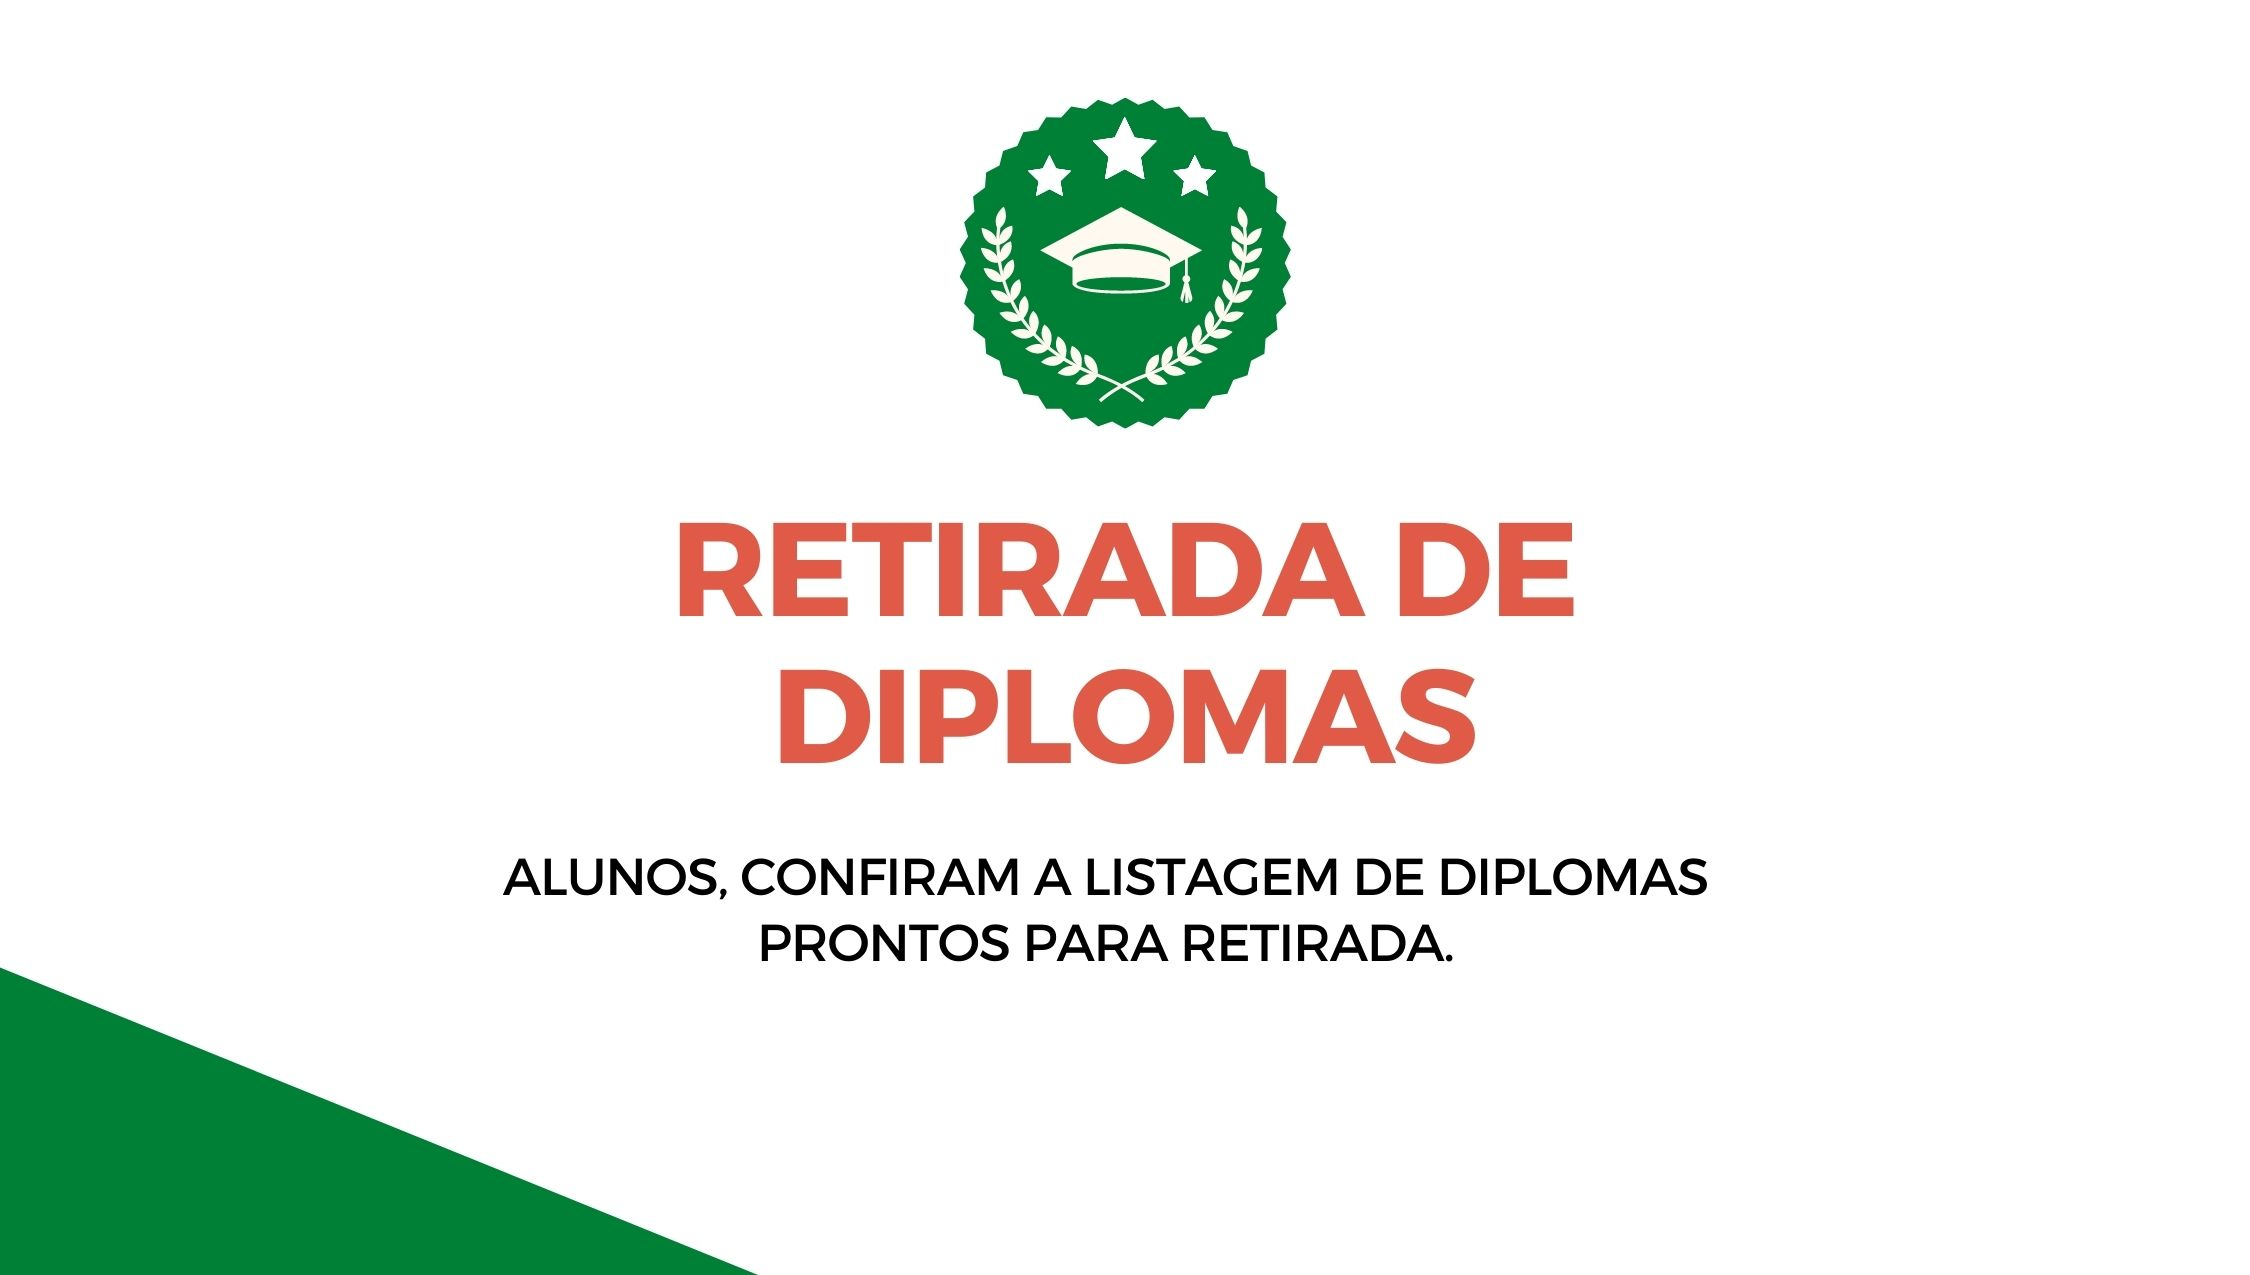 Retirada de Diplomas - Cursos Superiores